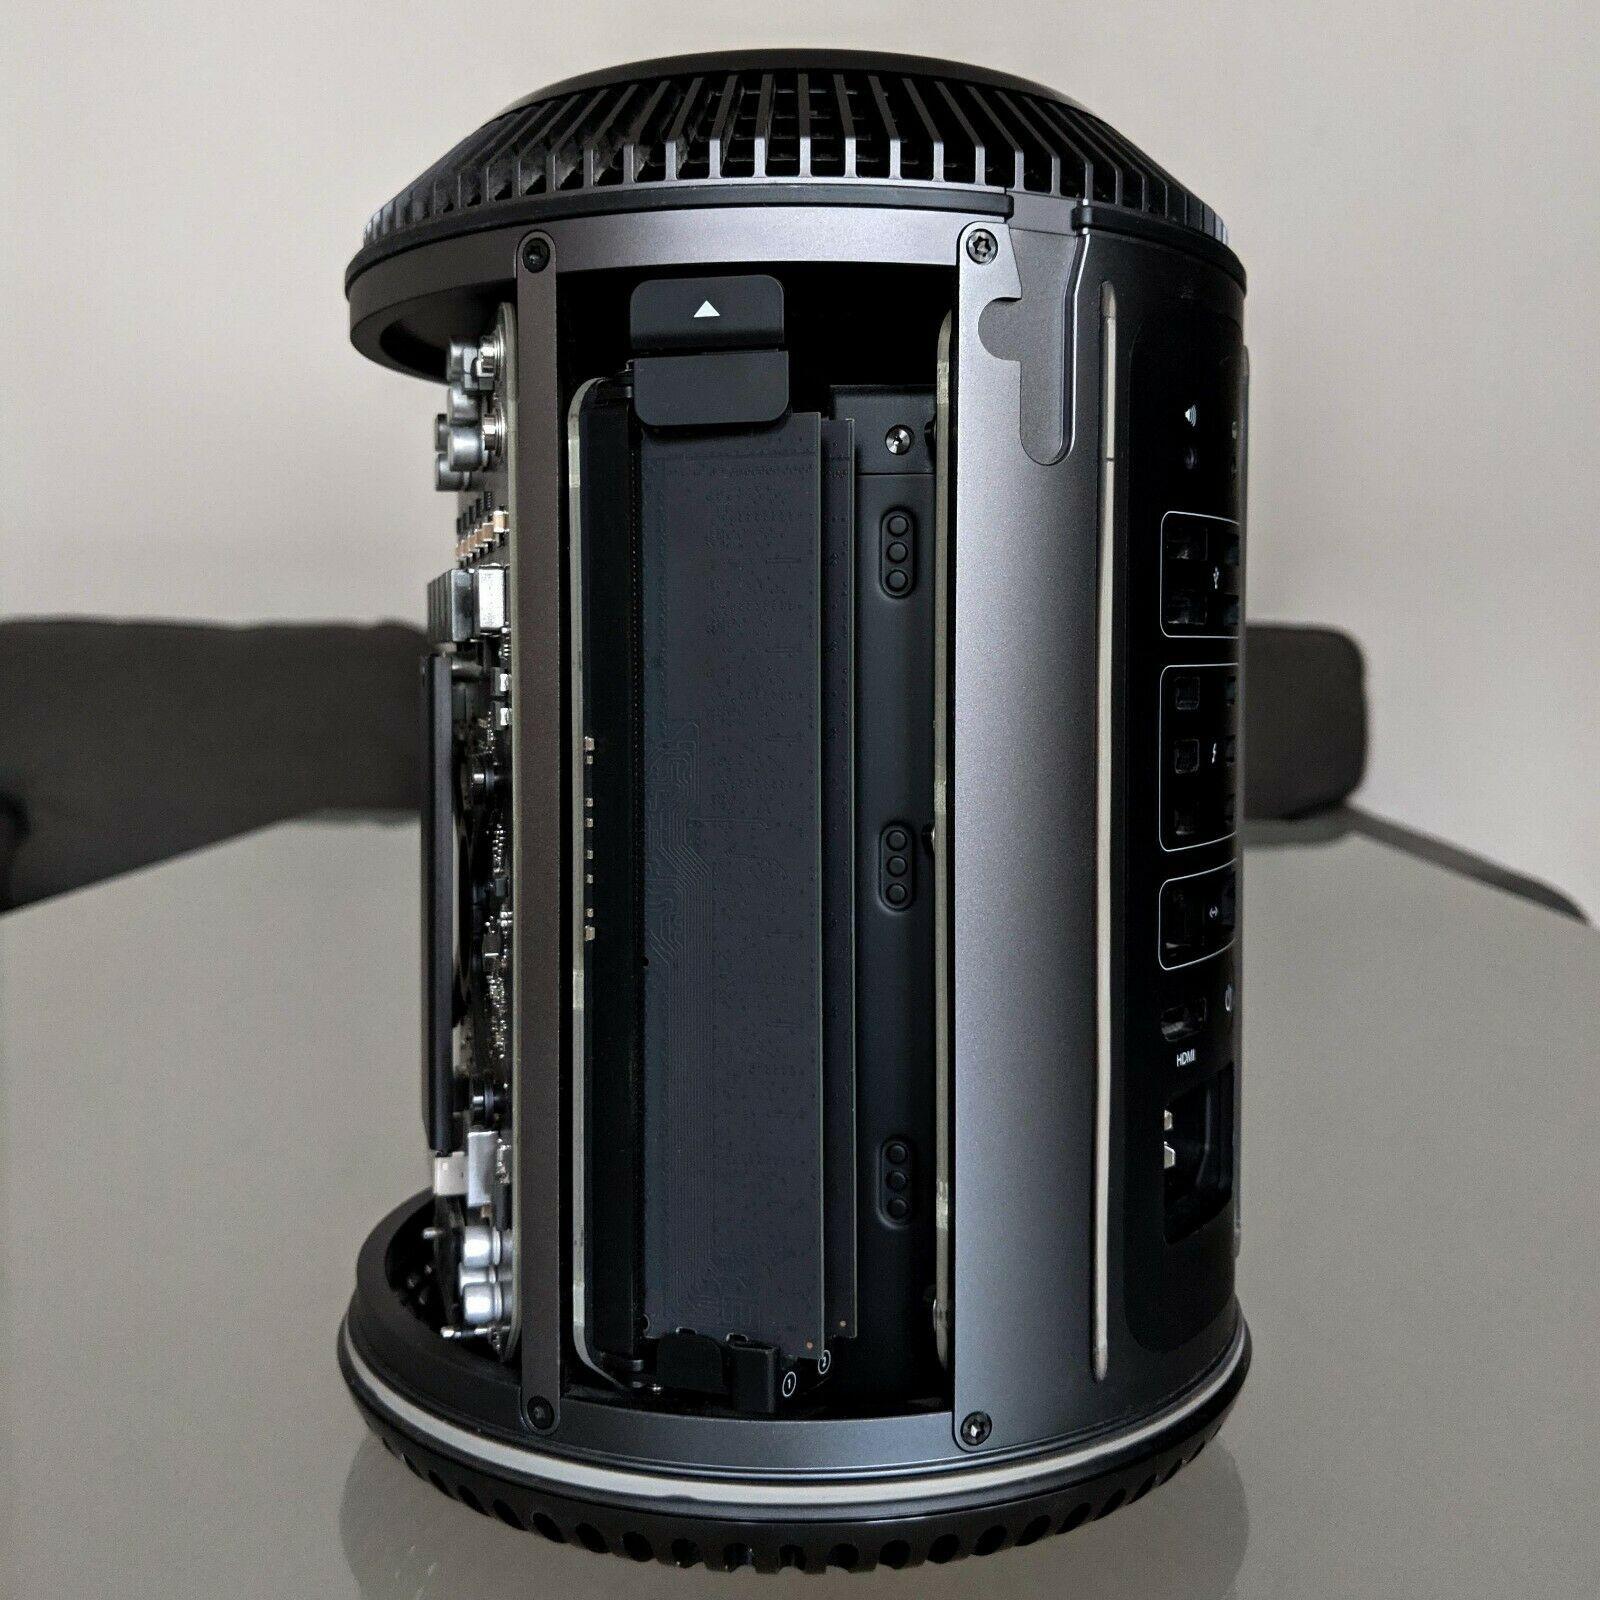 Mac Pro 2013 12 cores Intel Xeon @  2,7Ghz 64Go de Ram - 512Go SSD - AMD FirePro D500 x 2